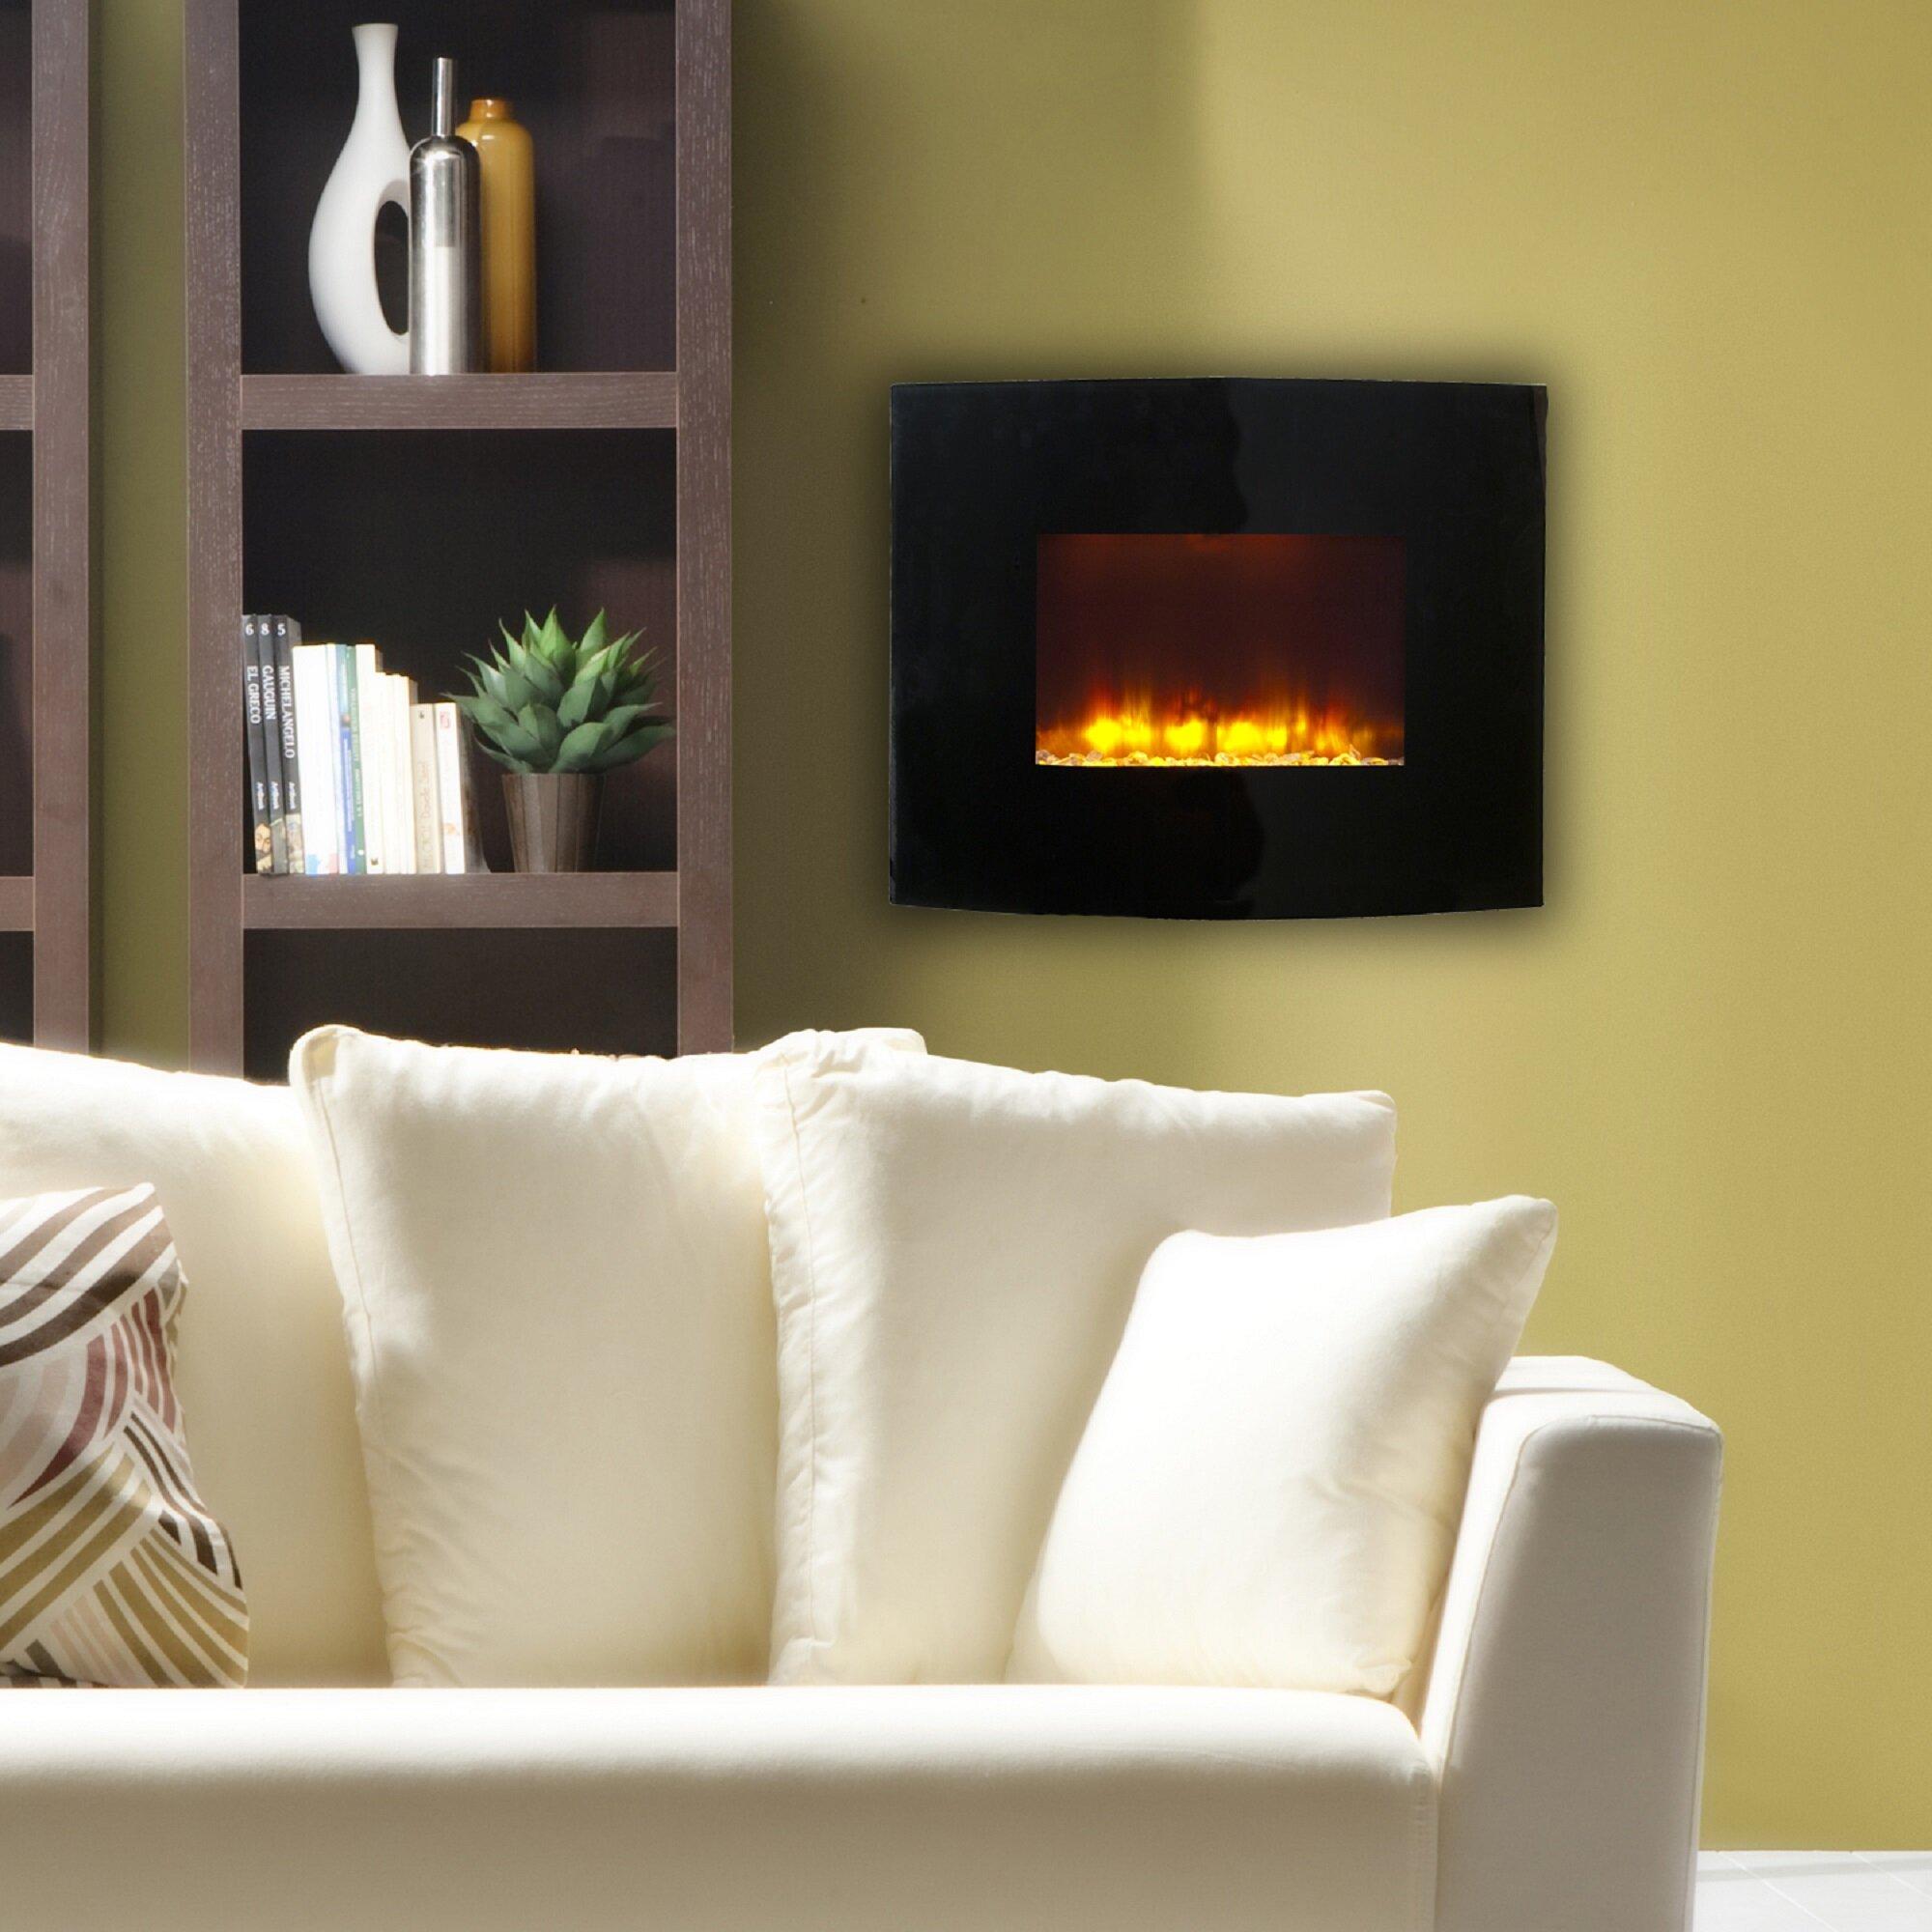 Estate Designs Flat Panel Wall Mount Electric Fireplace